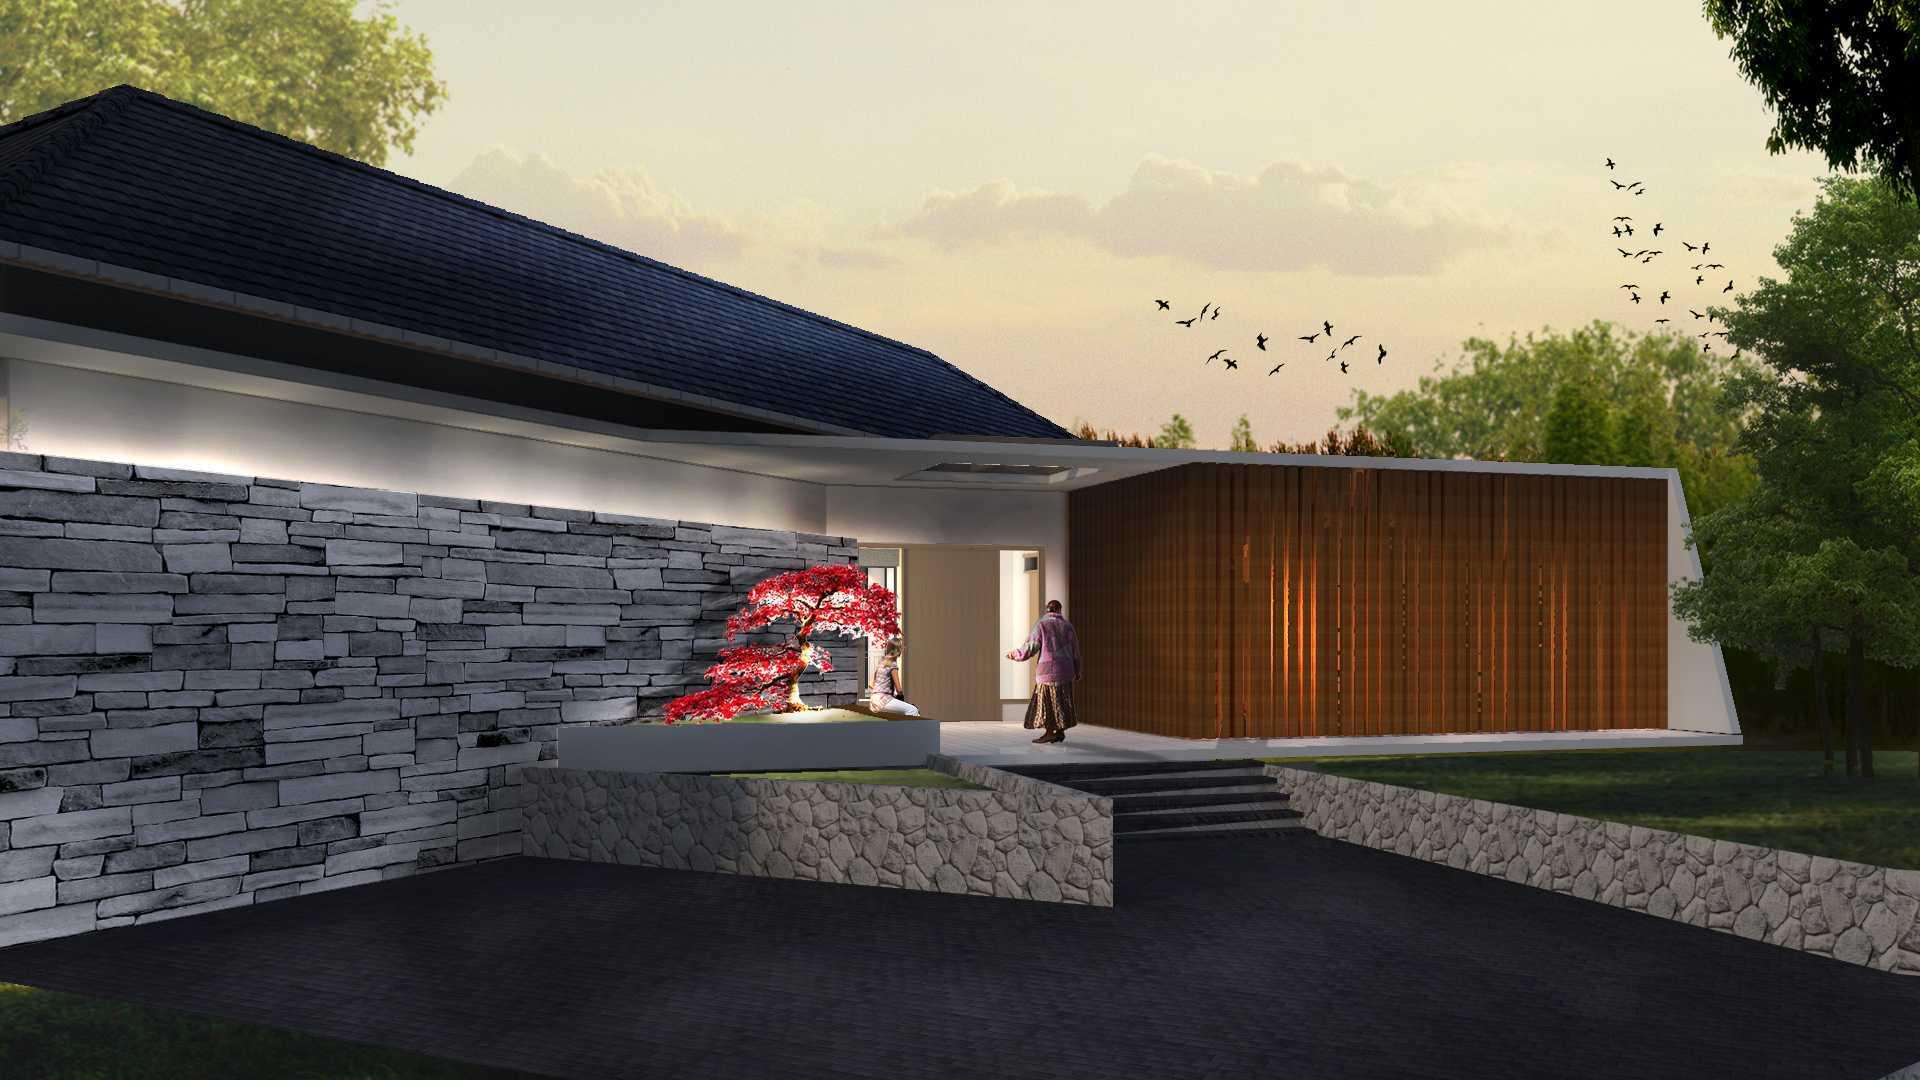 Atelier Ara Golden Groove Sukabumi, Sukabumi Regency, Jawa Barat, Indonesia Sukabumi, Sukabumi Regency, Jawa Barat, Indonesia Tipe 5  79085